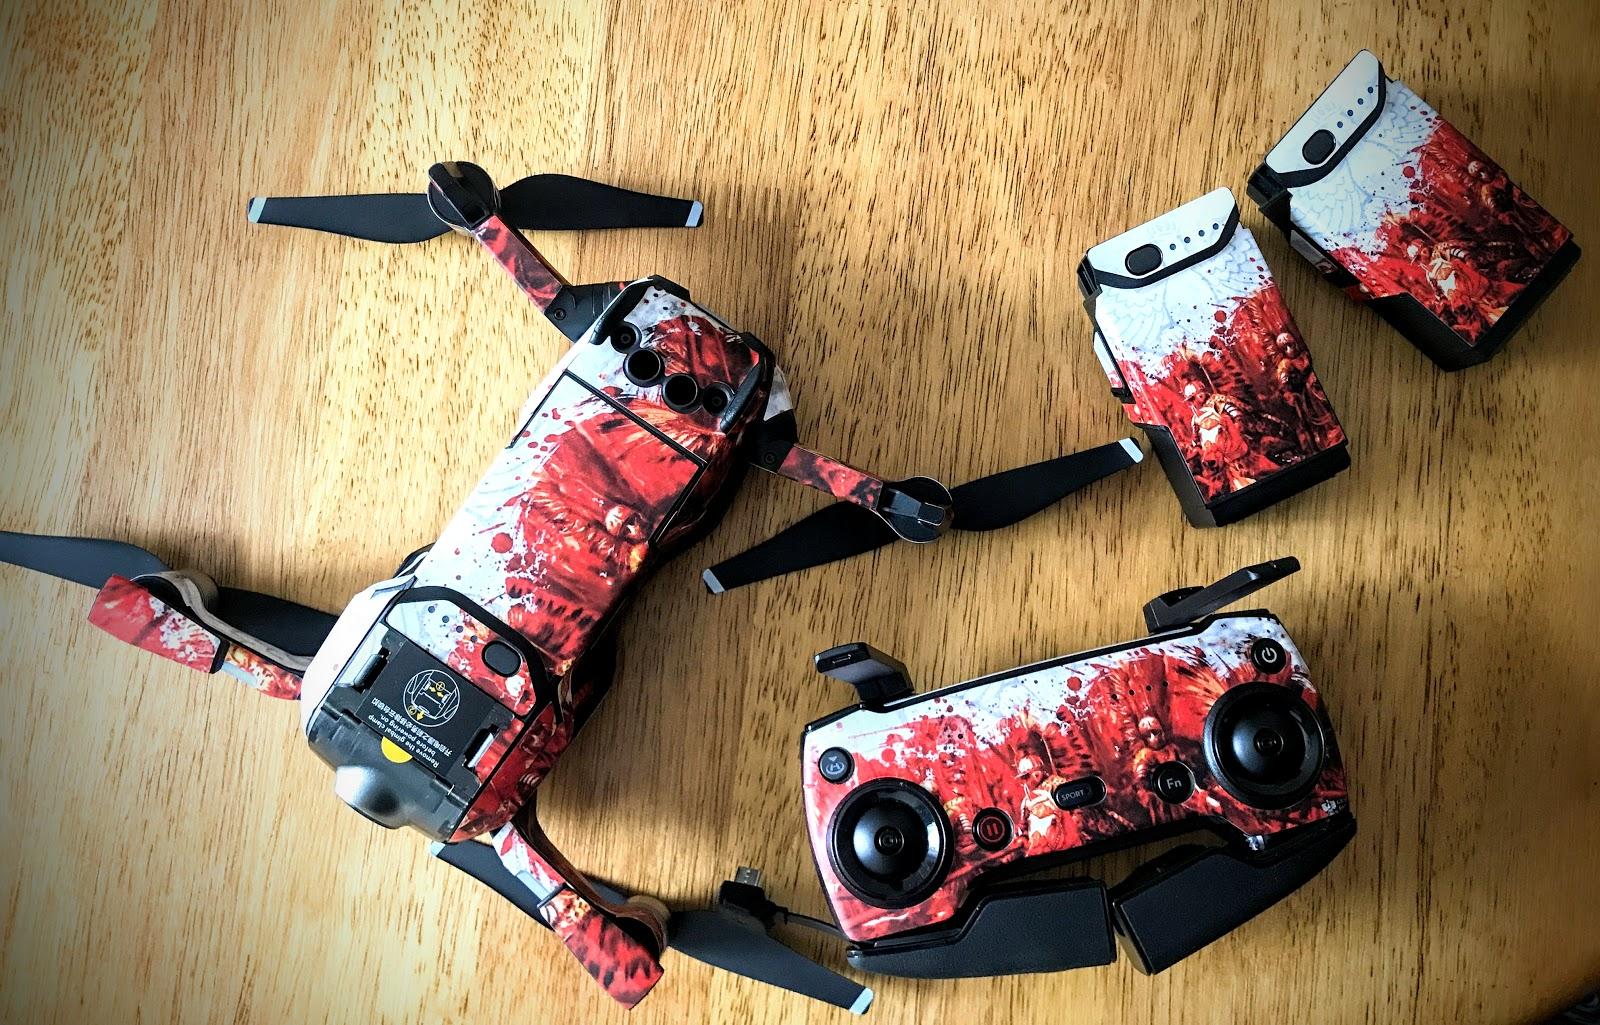 Skiny do drona od DecalGirl - recenzja